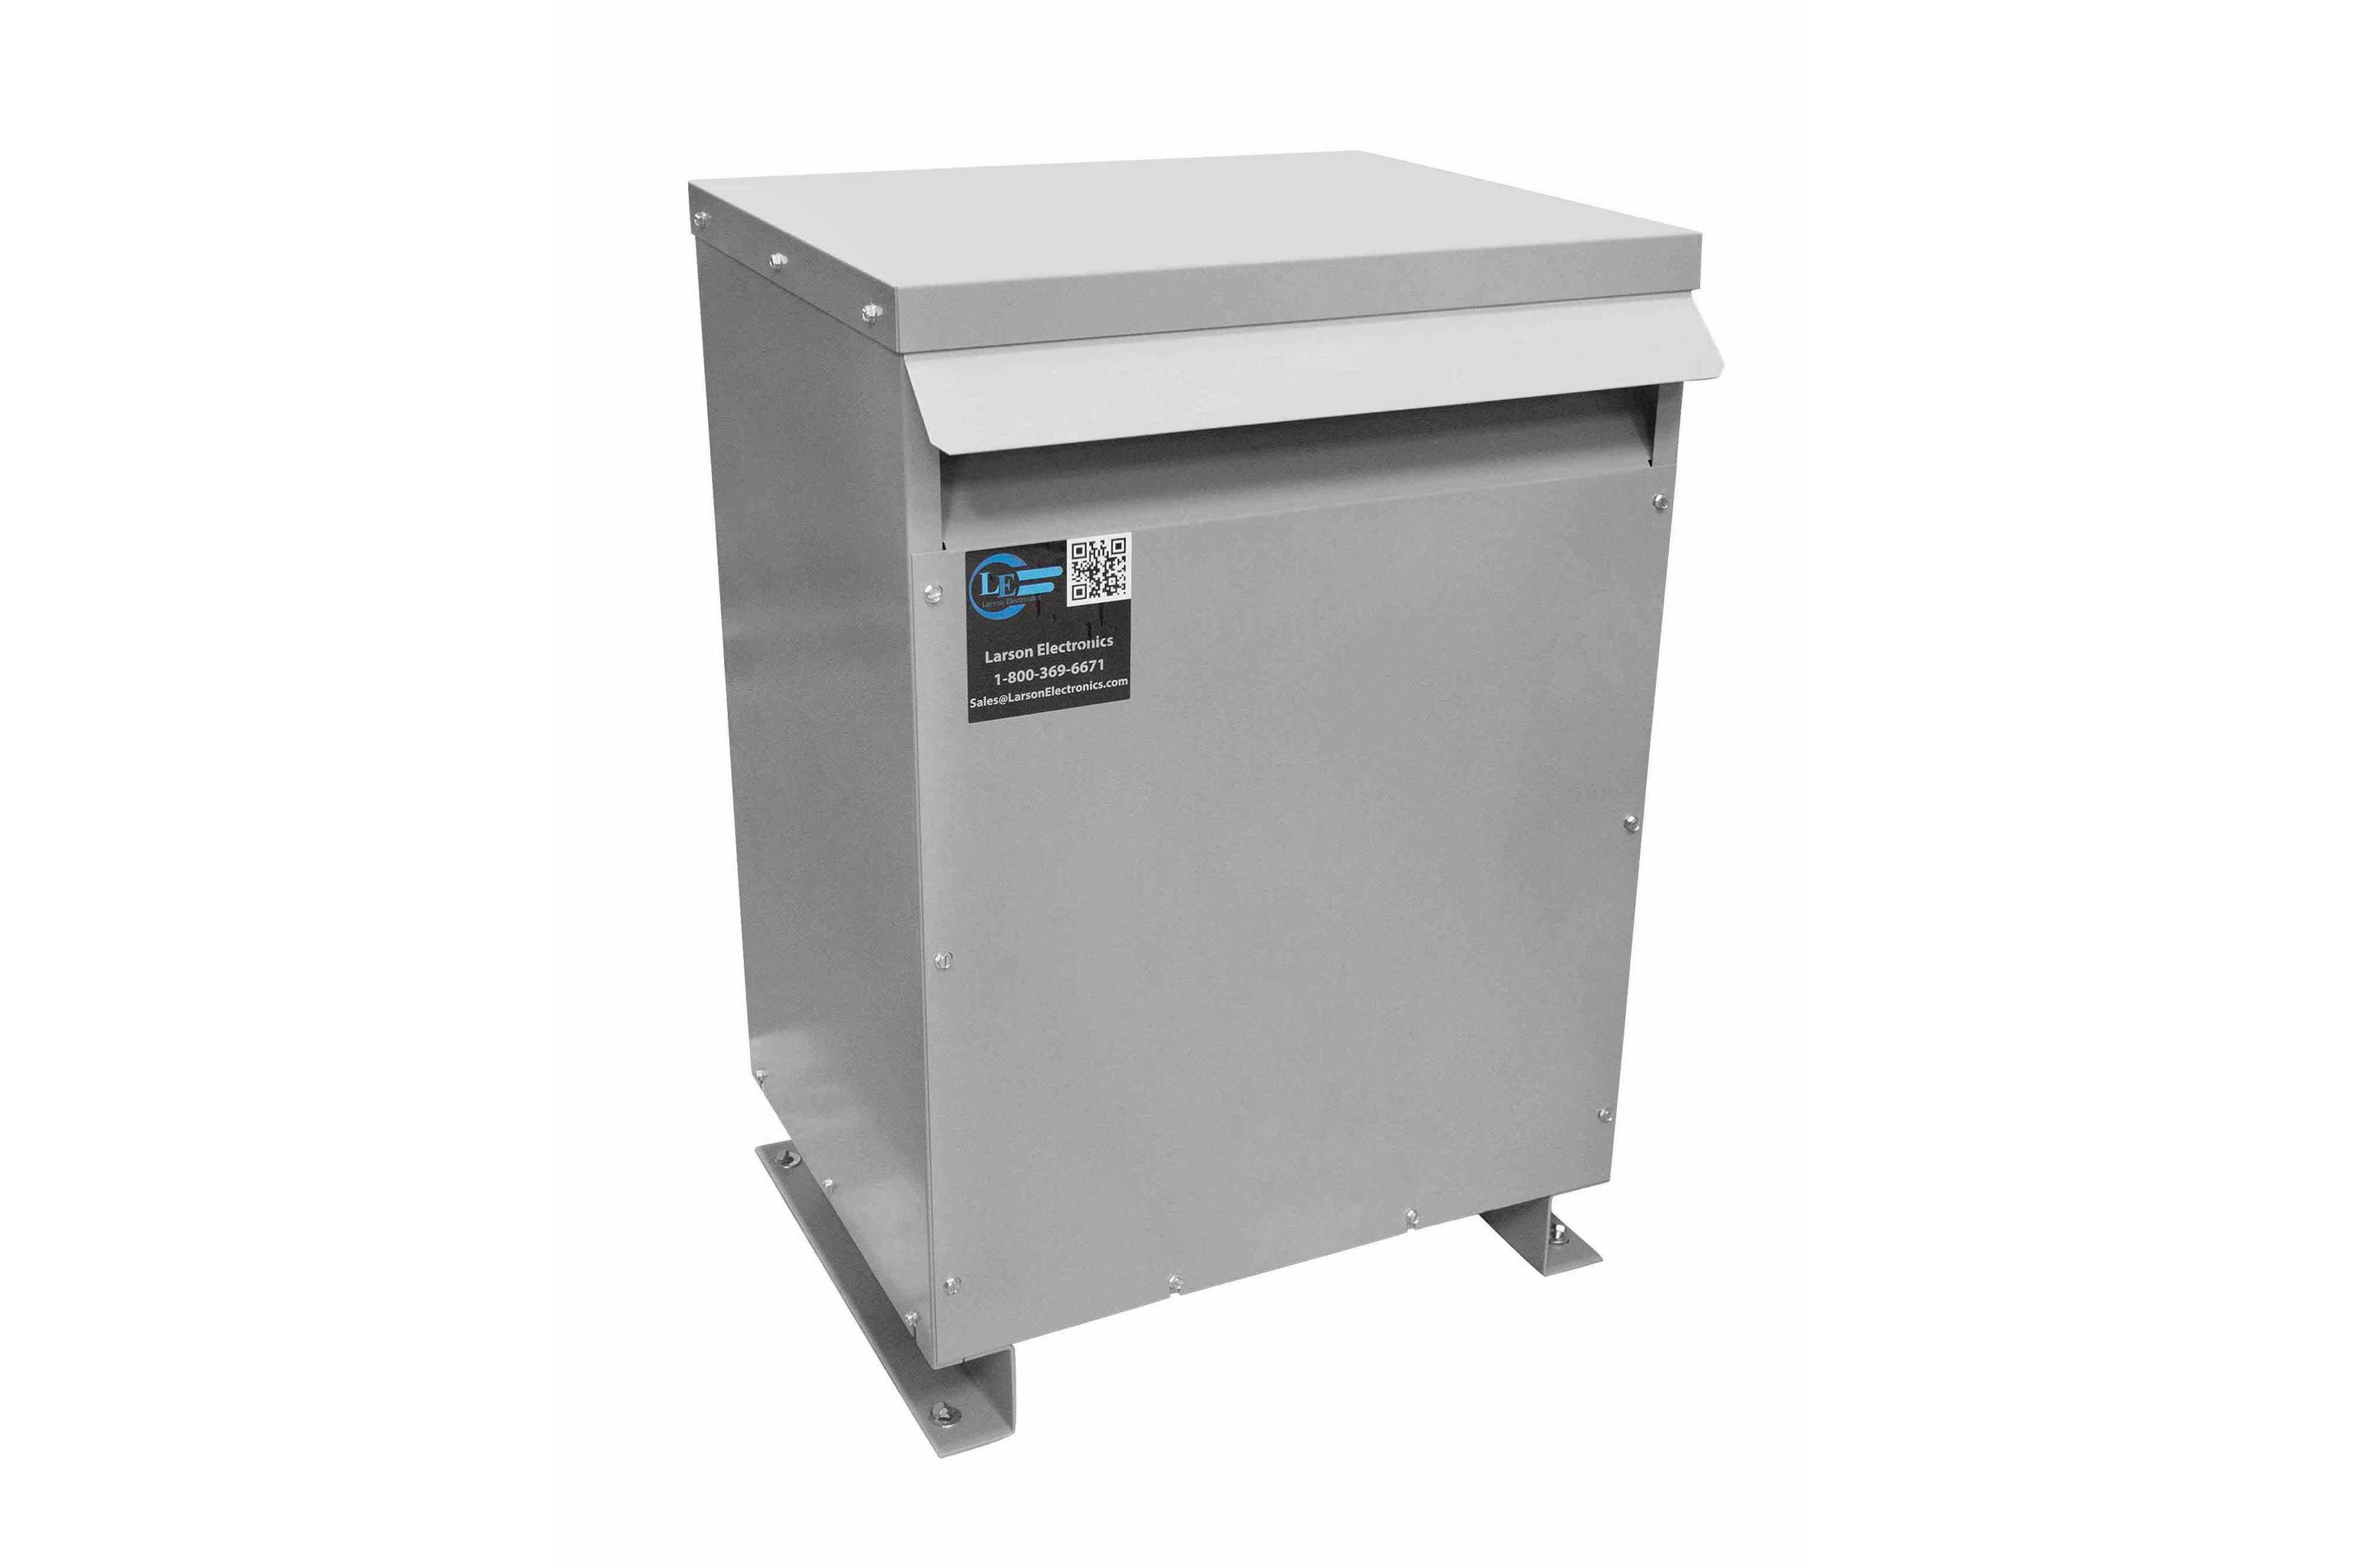 237.5 kVA 3PH Isolation Transformer, 600V Wye Primary, 400Y/231 Wye-N Secondary, N3R, Ventilated, 60 Hz